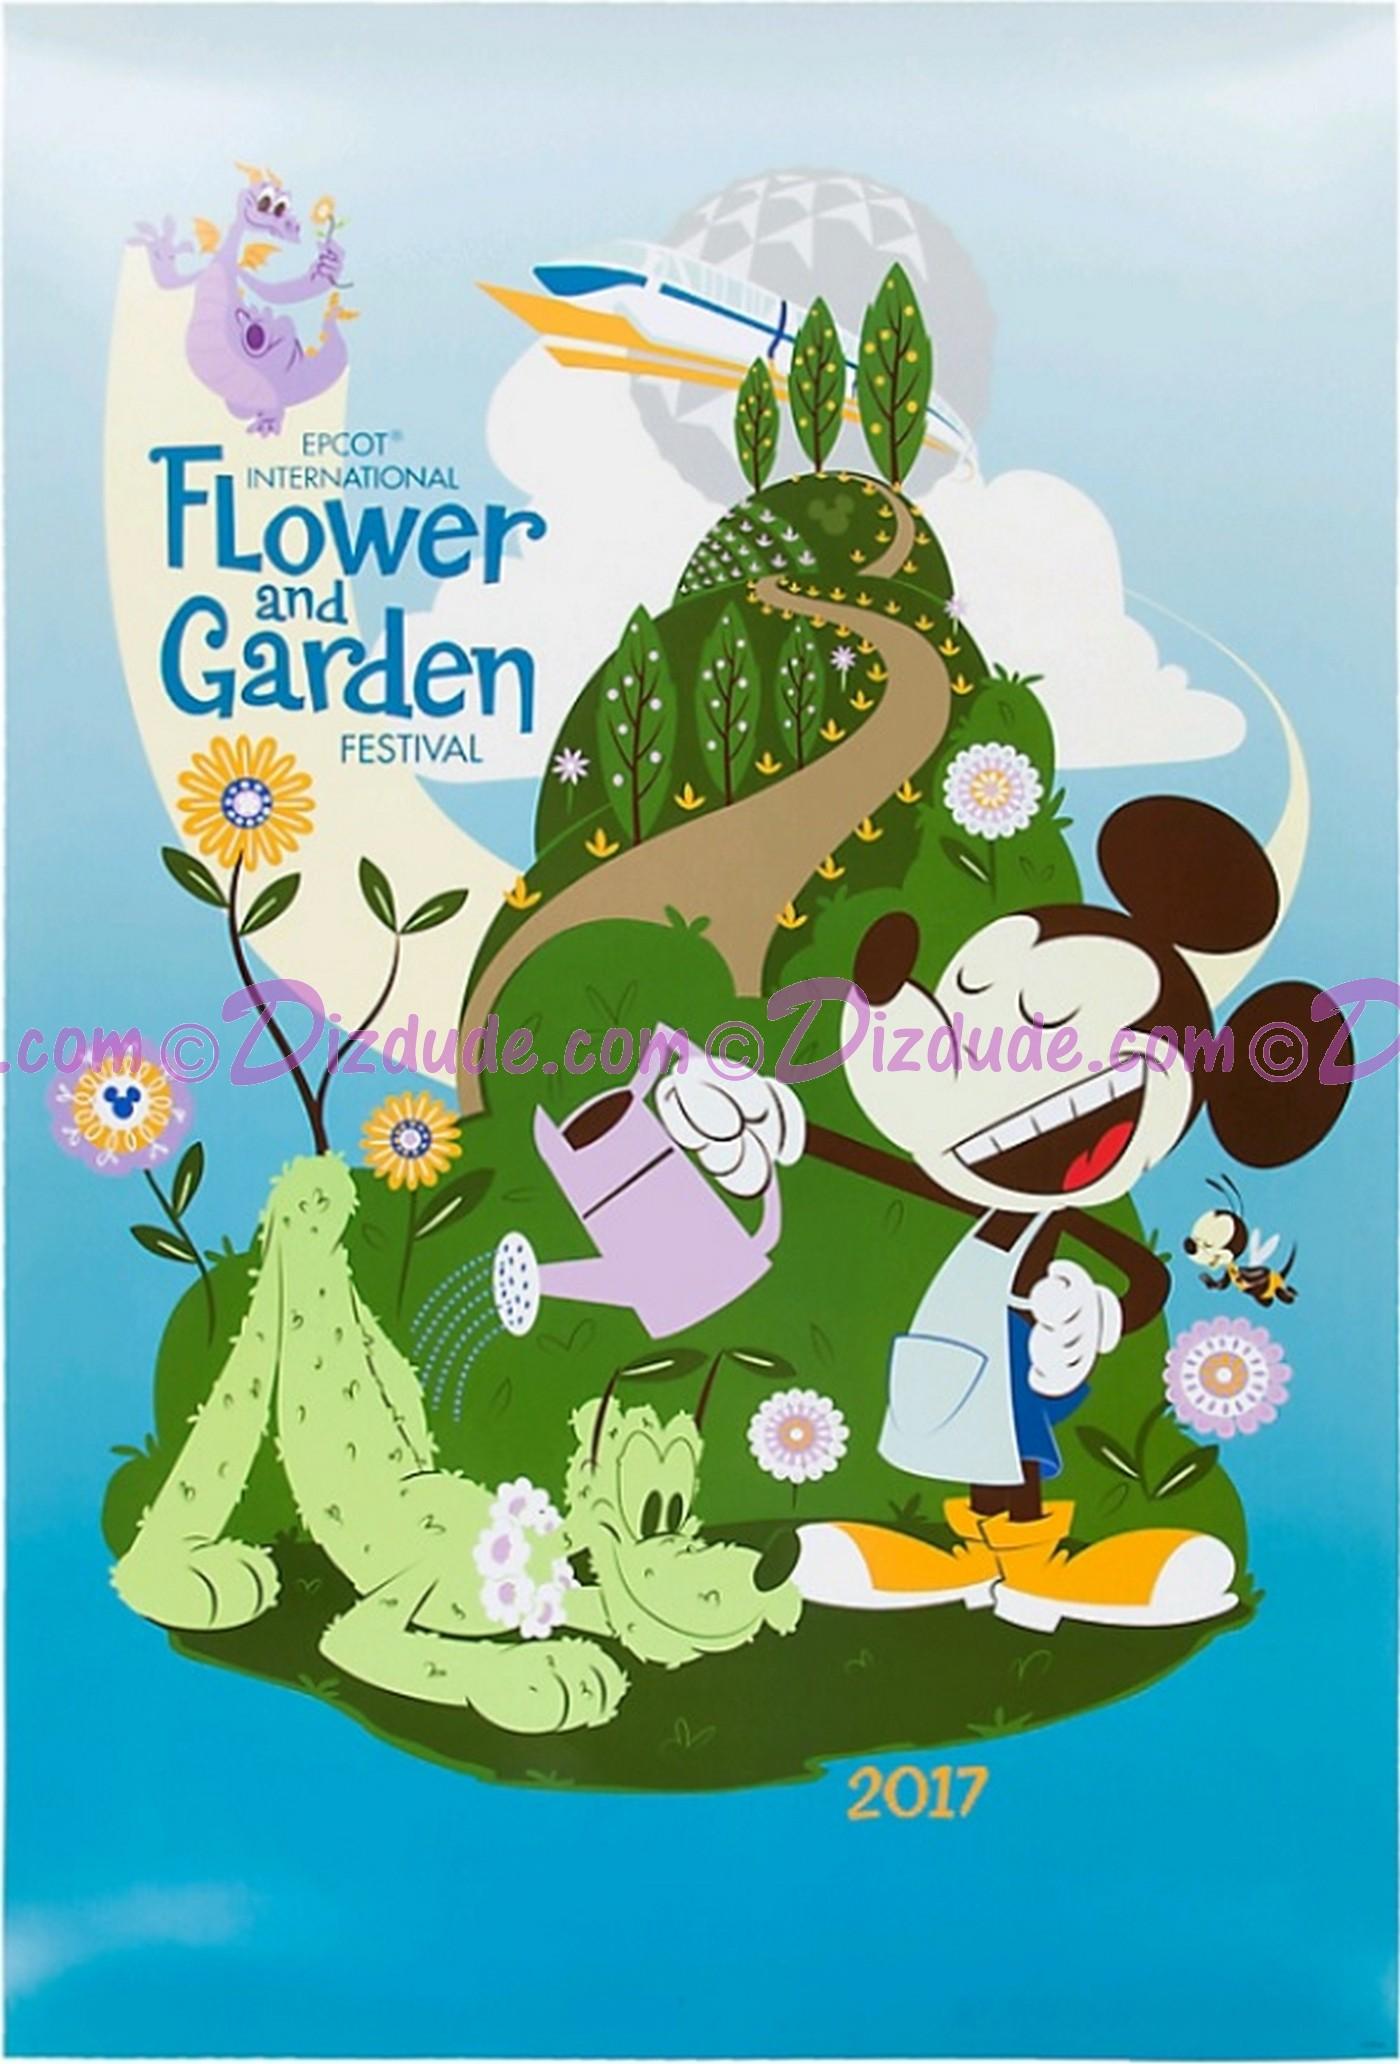 dizdude | disney epcot international flower & garden festival